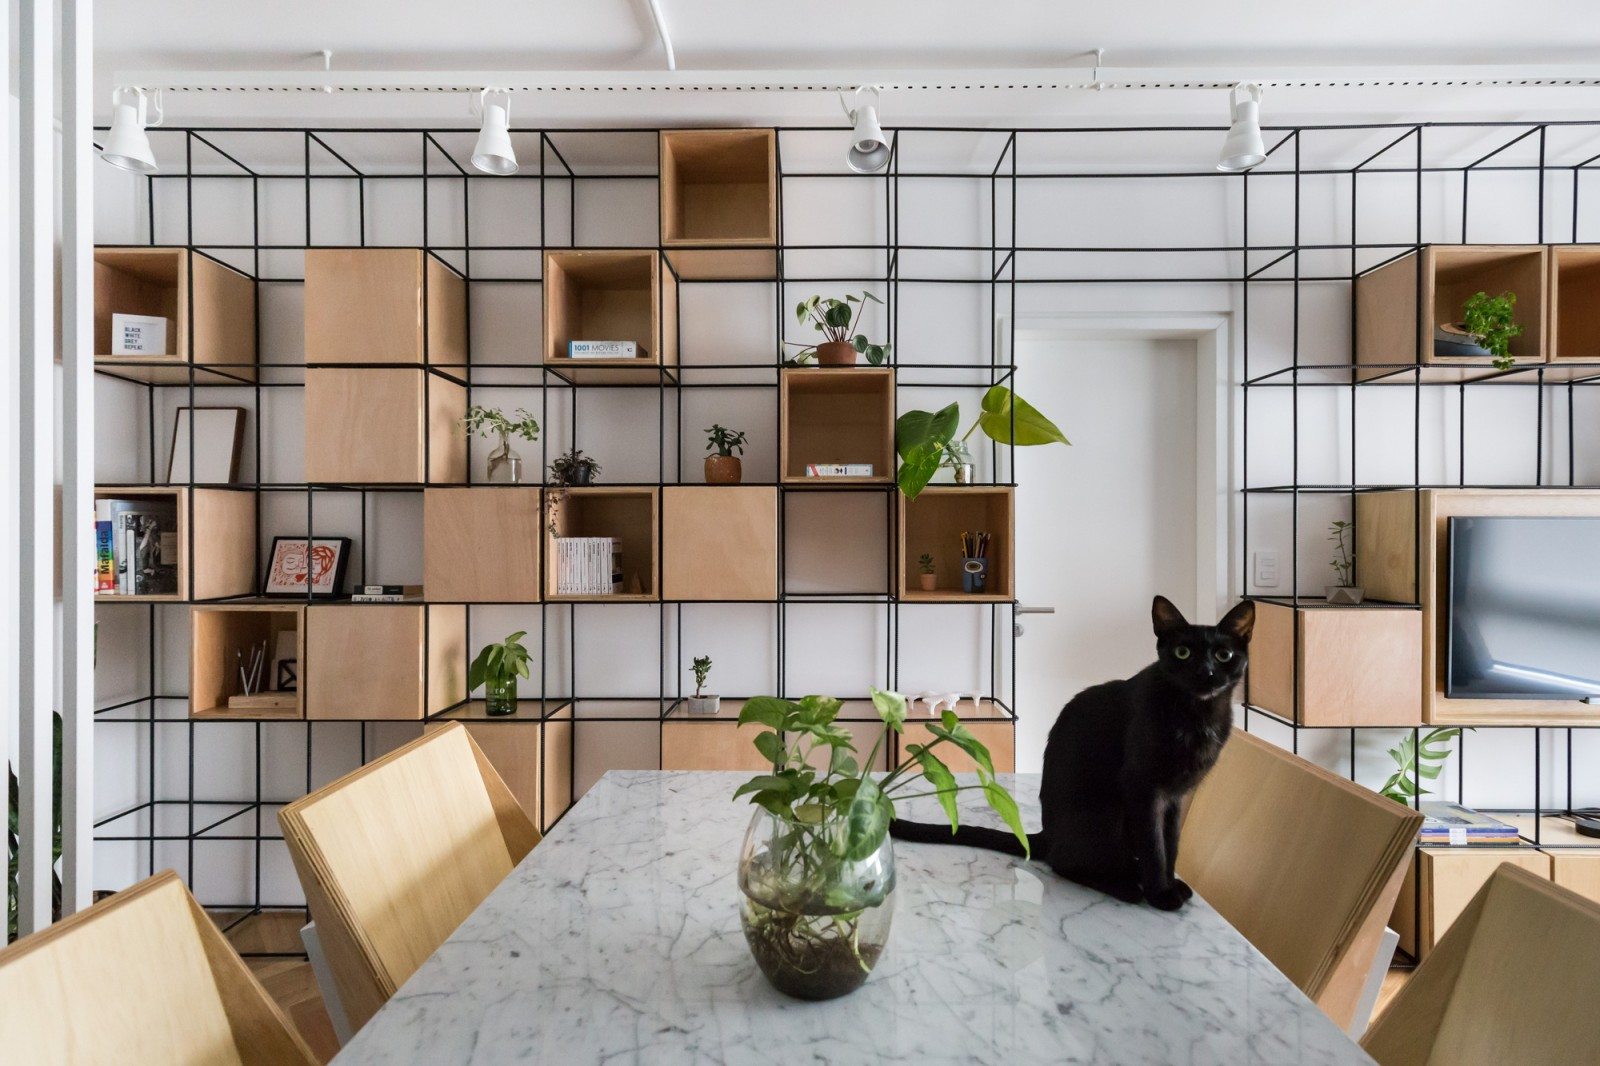 Santana Apartment / Atelier Aberto Arquitetura